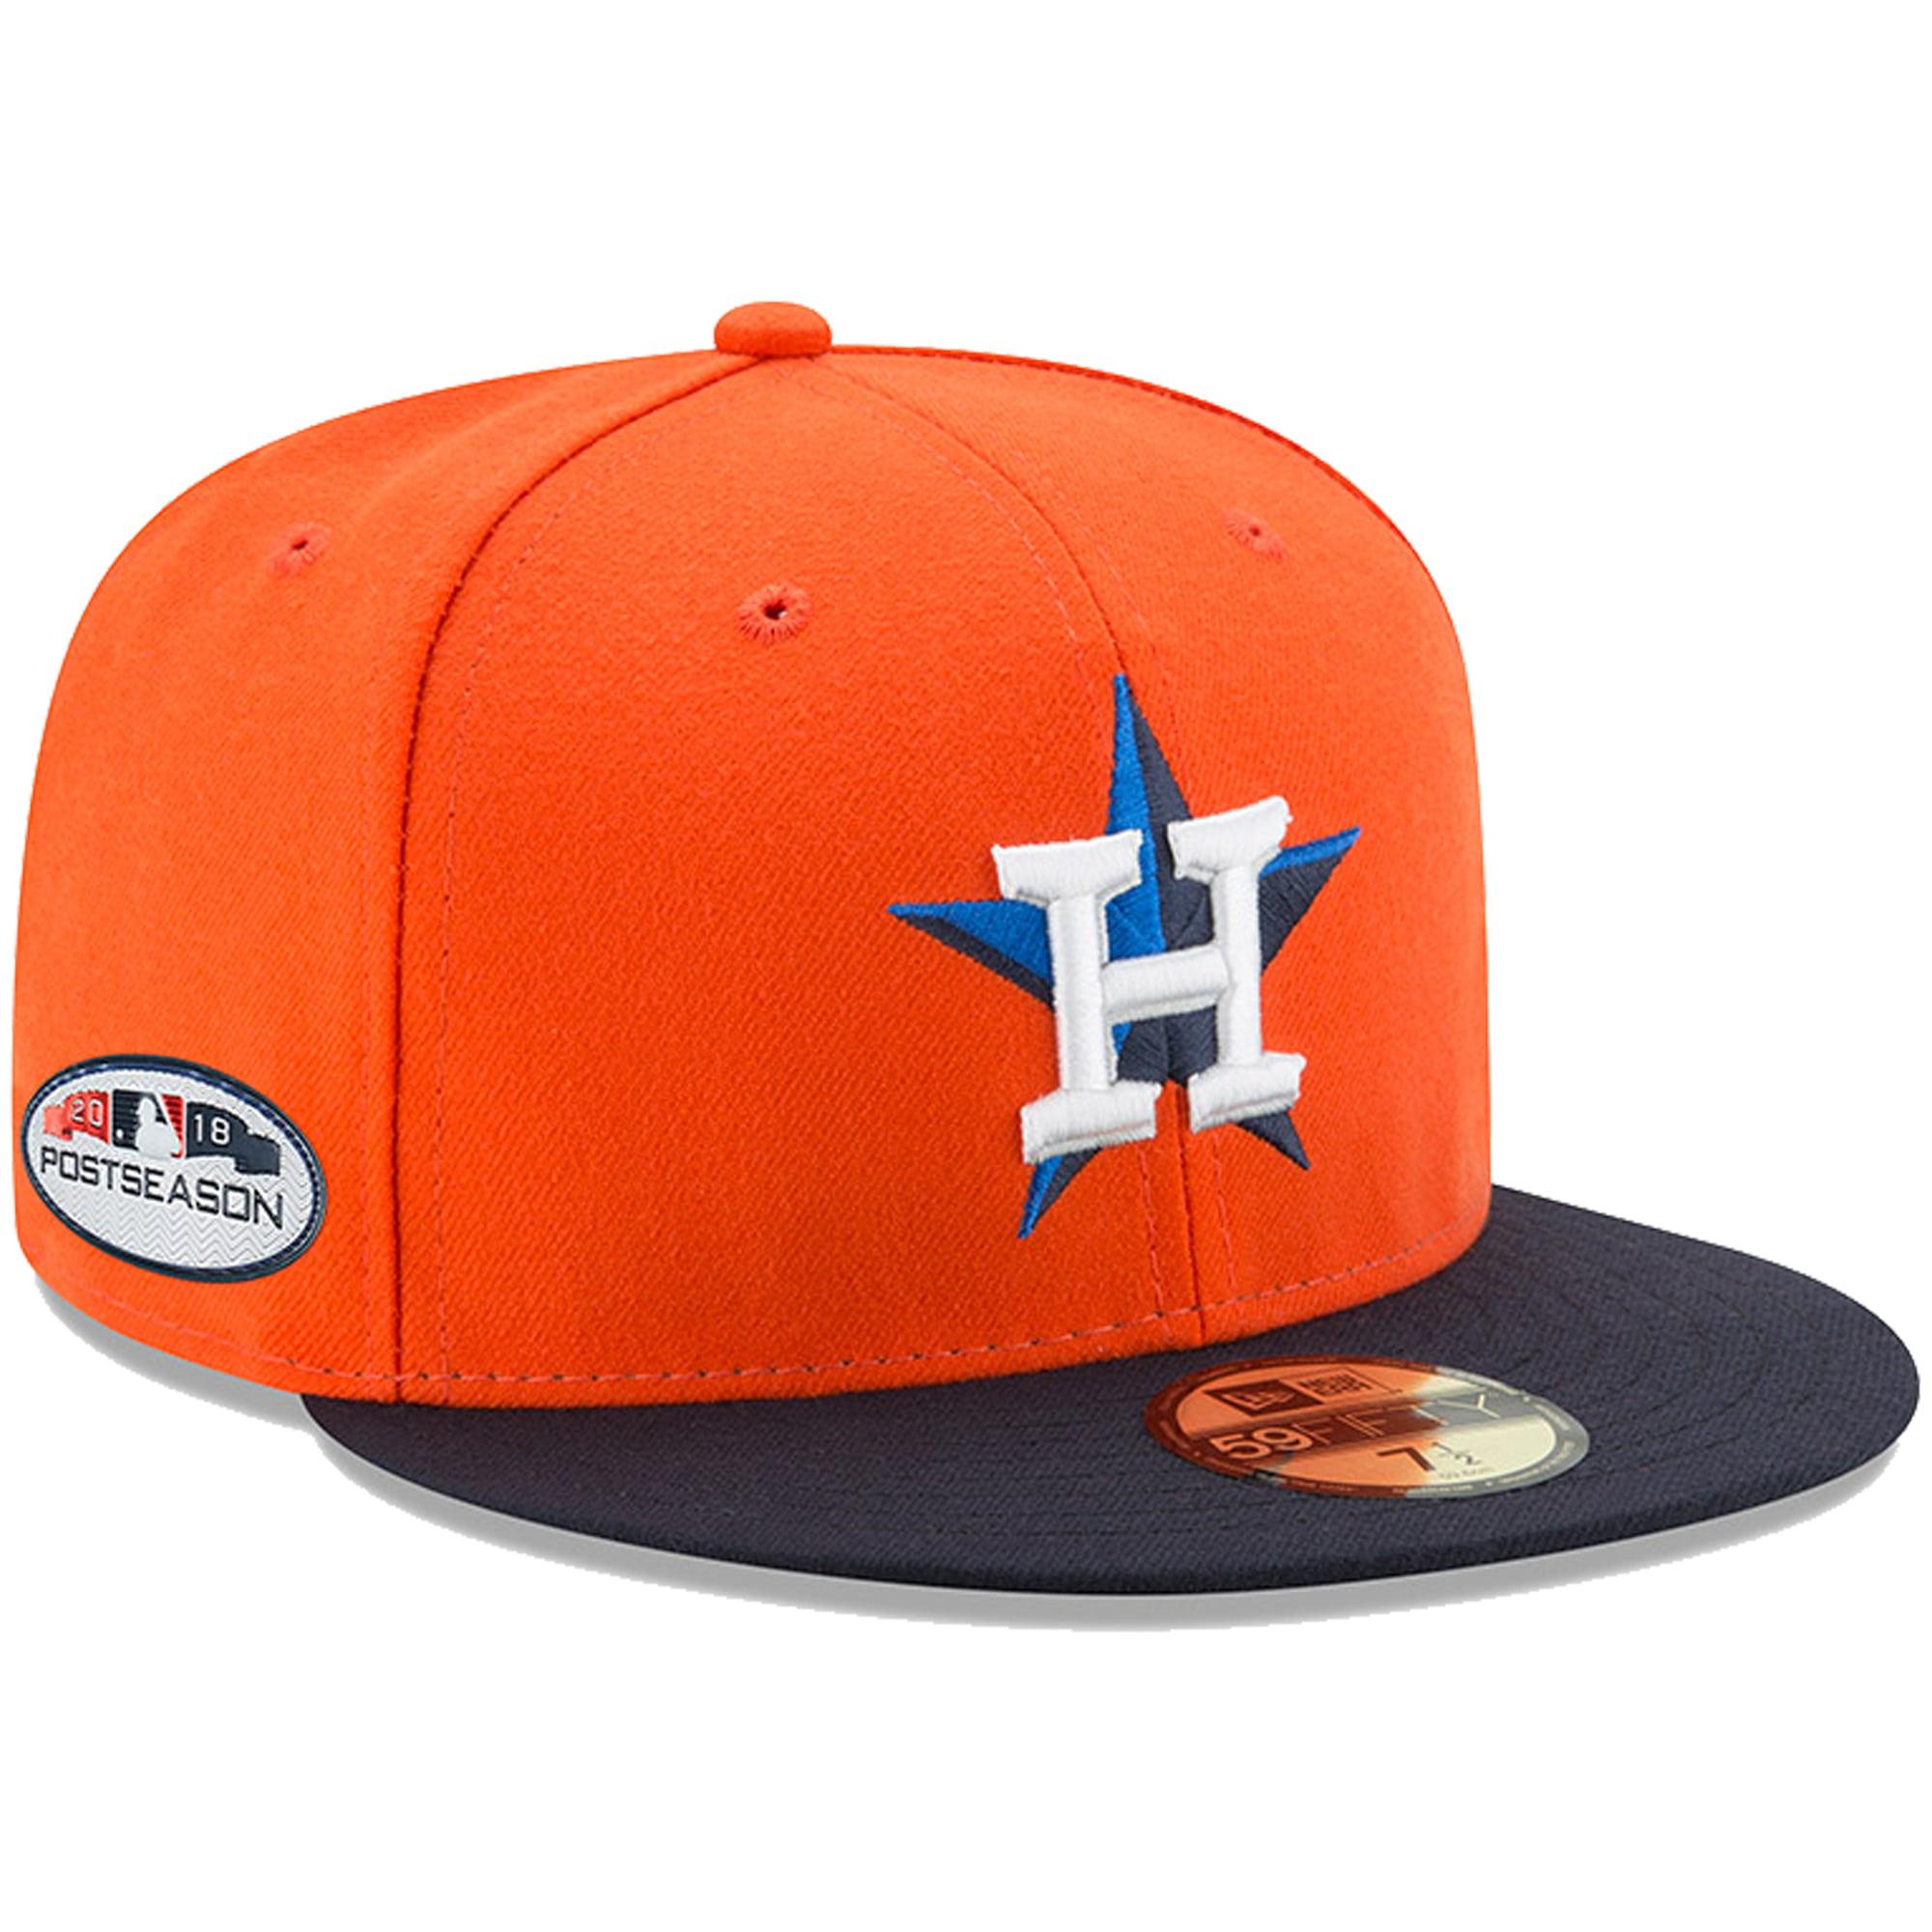 Houston Astros New Era 2018 Postseason Side Patch 59FIFTY Fitted Hat - Orange